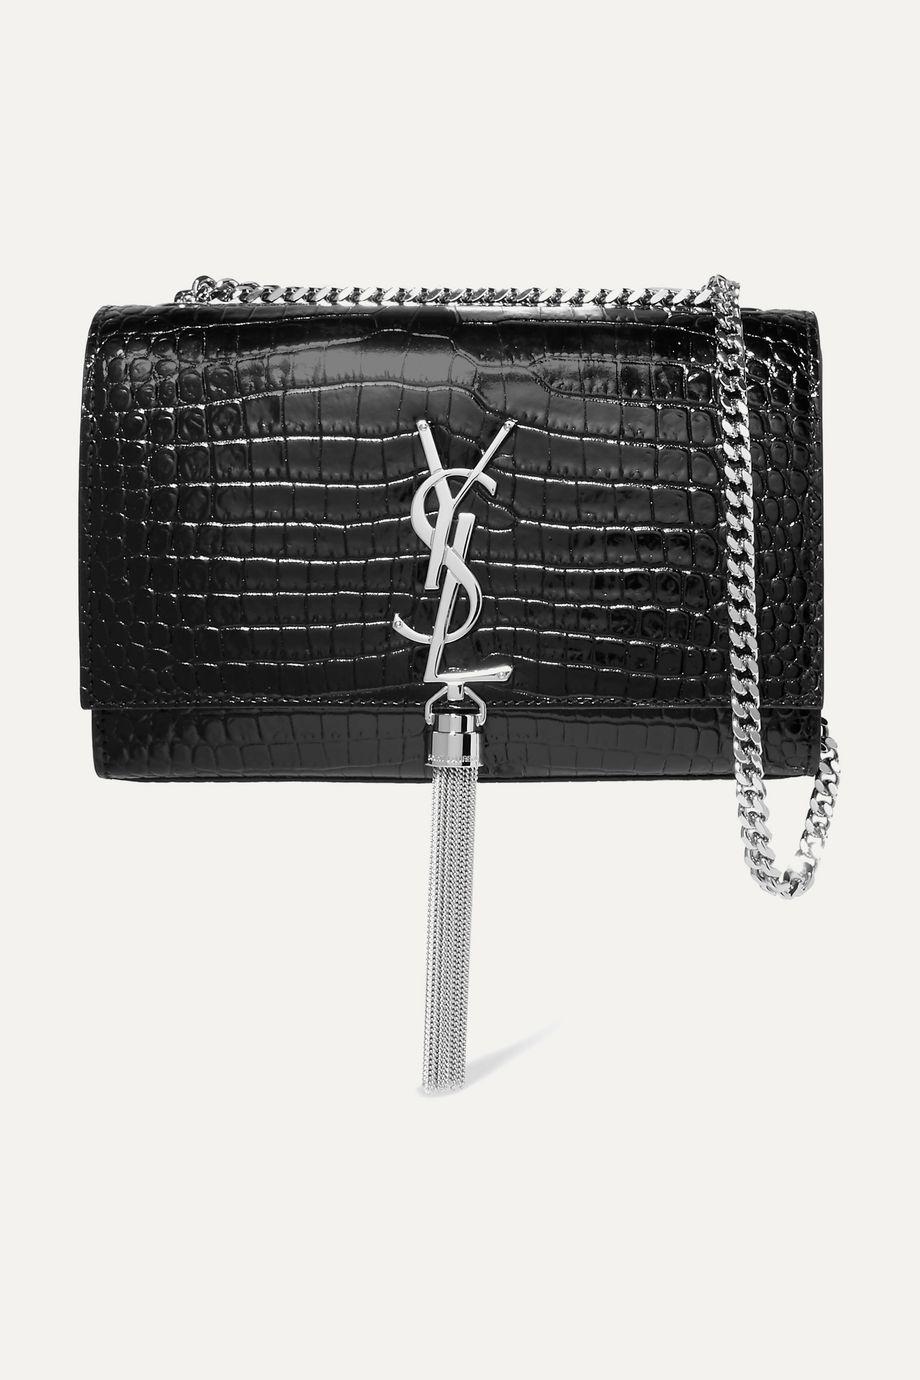 SAINT LAURENT Kate croc-effect leather shoulder bag